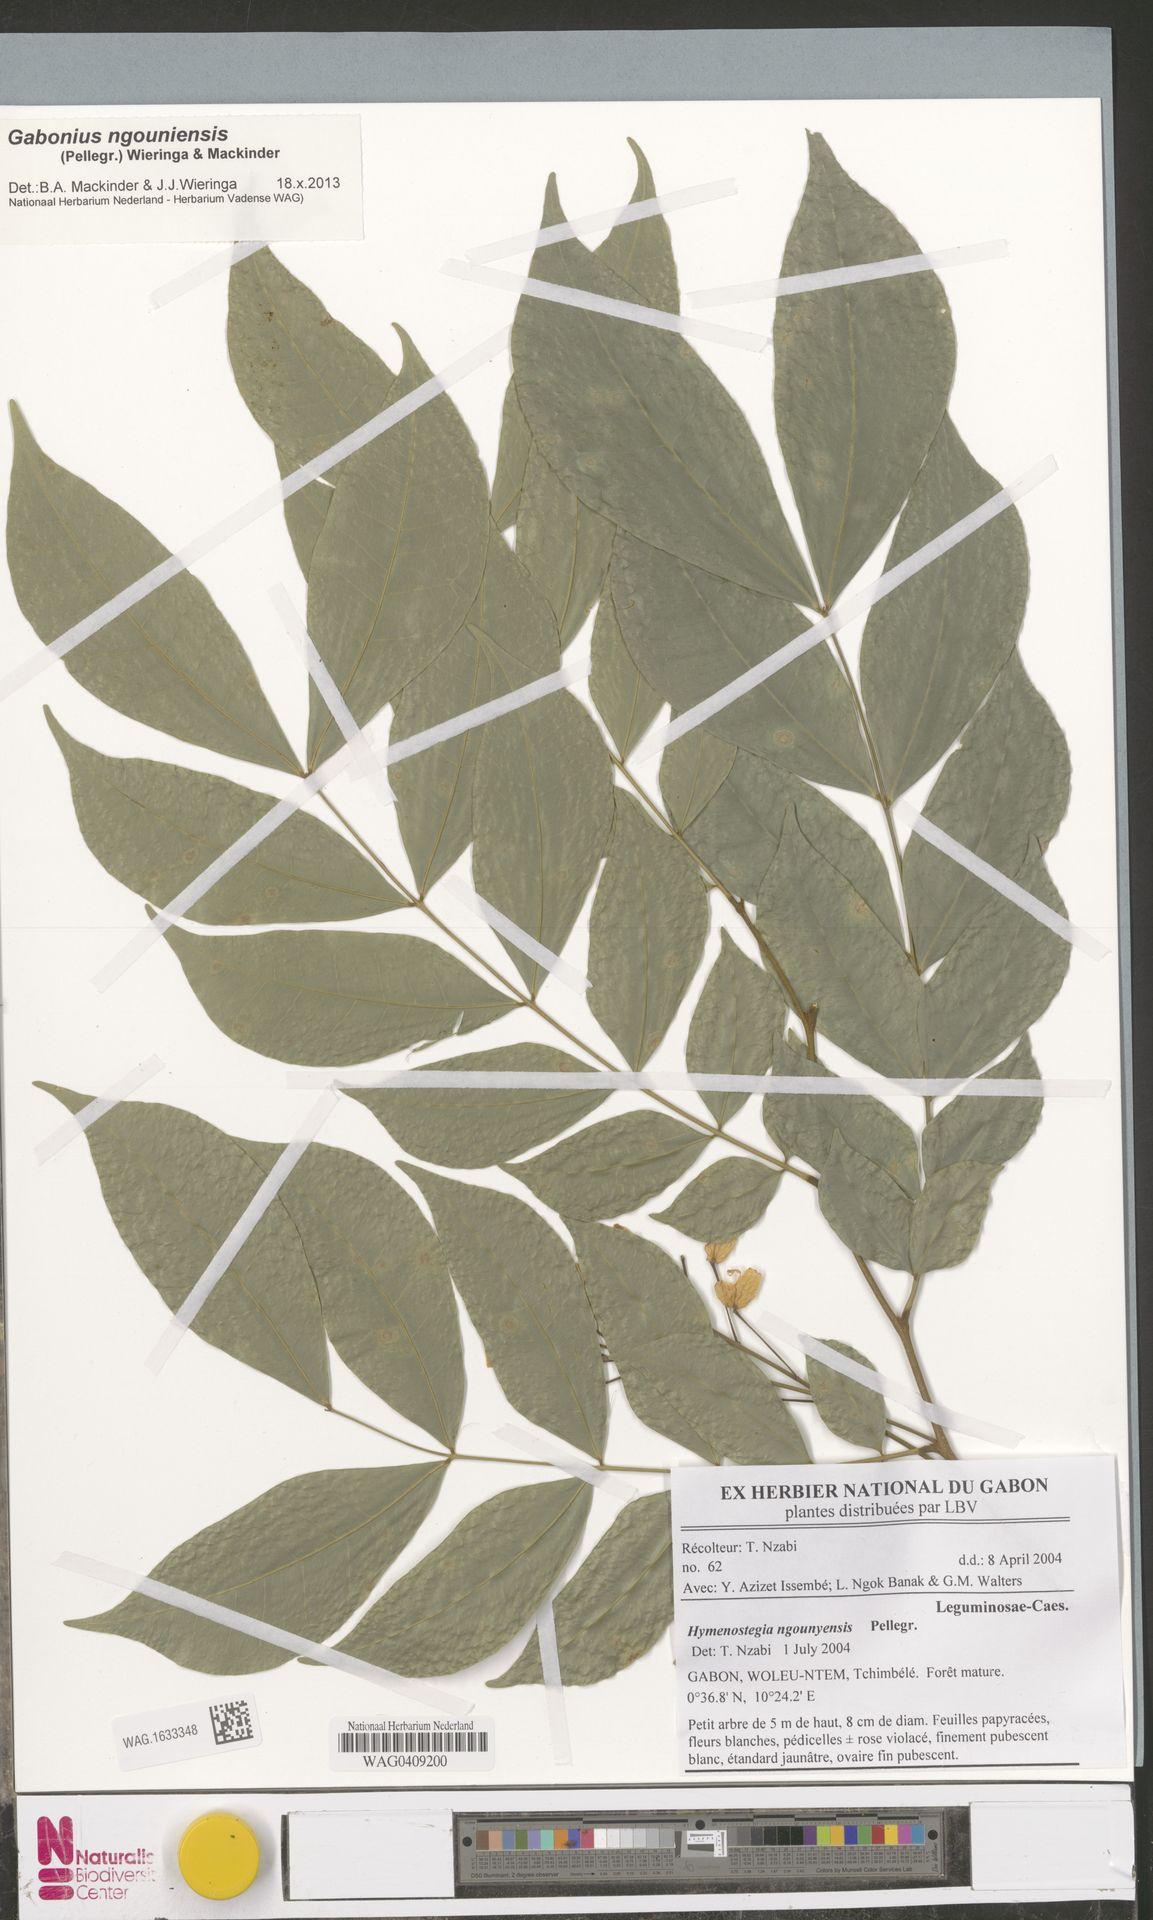 WAG.1633348 | Gabonius ngouniensis (Pellegr.) Wieringa & Mackinder